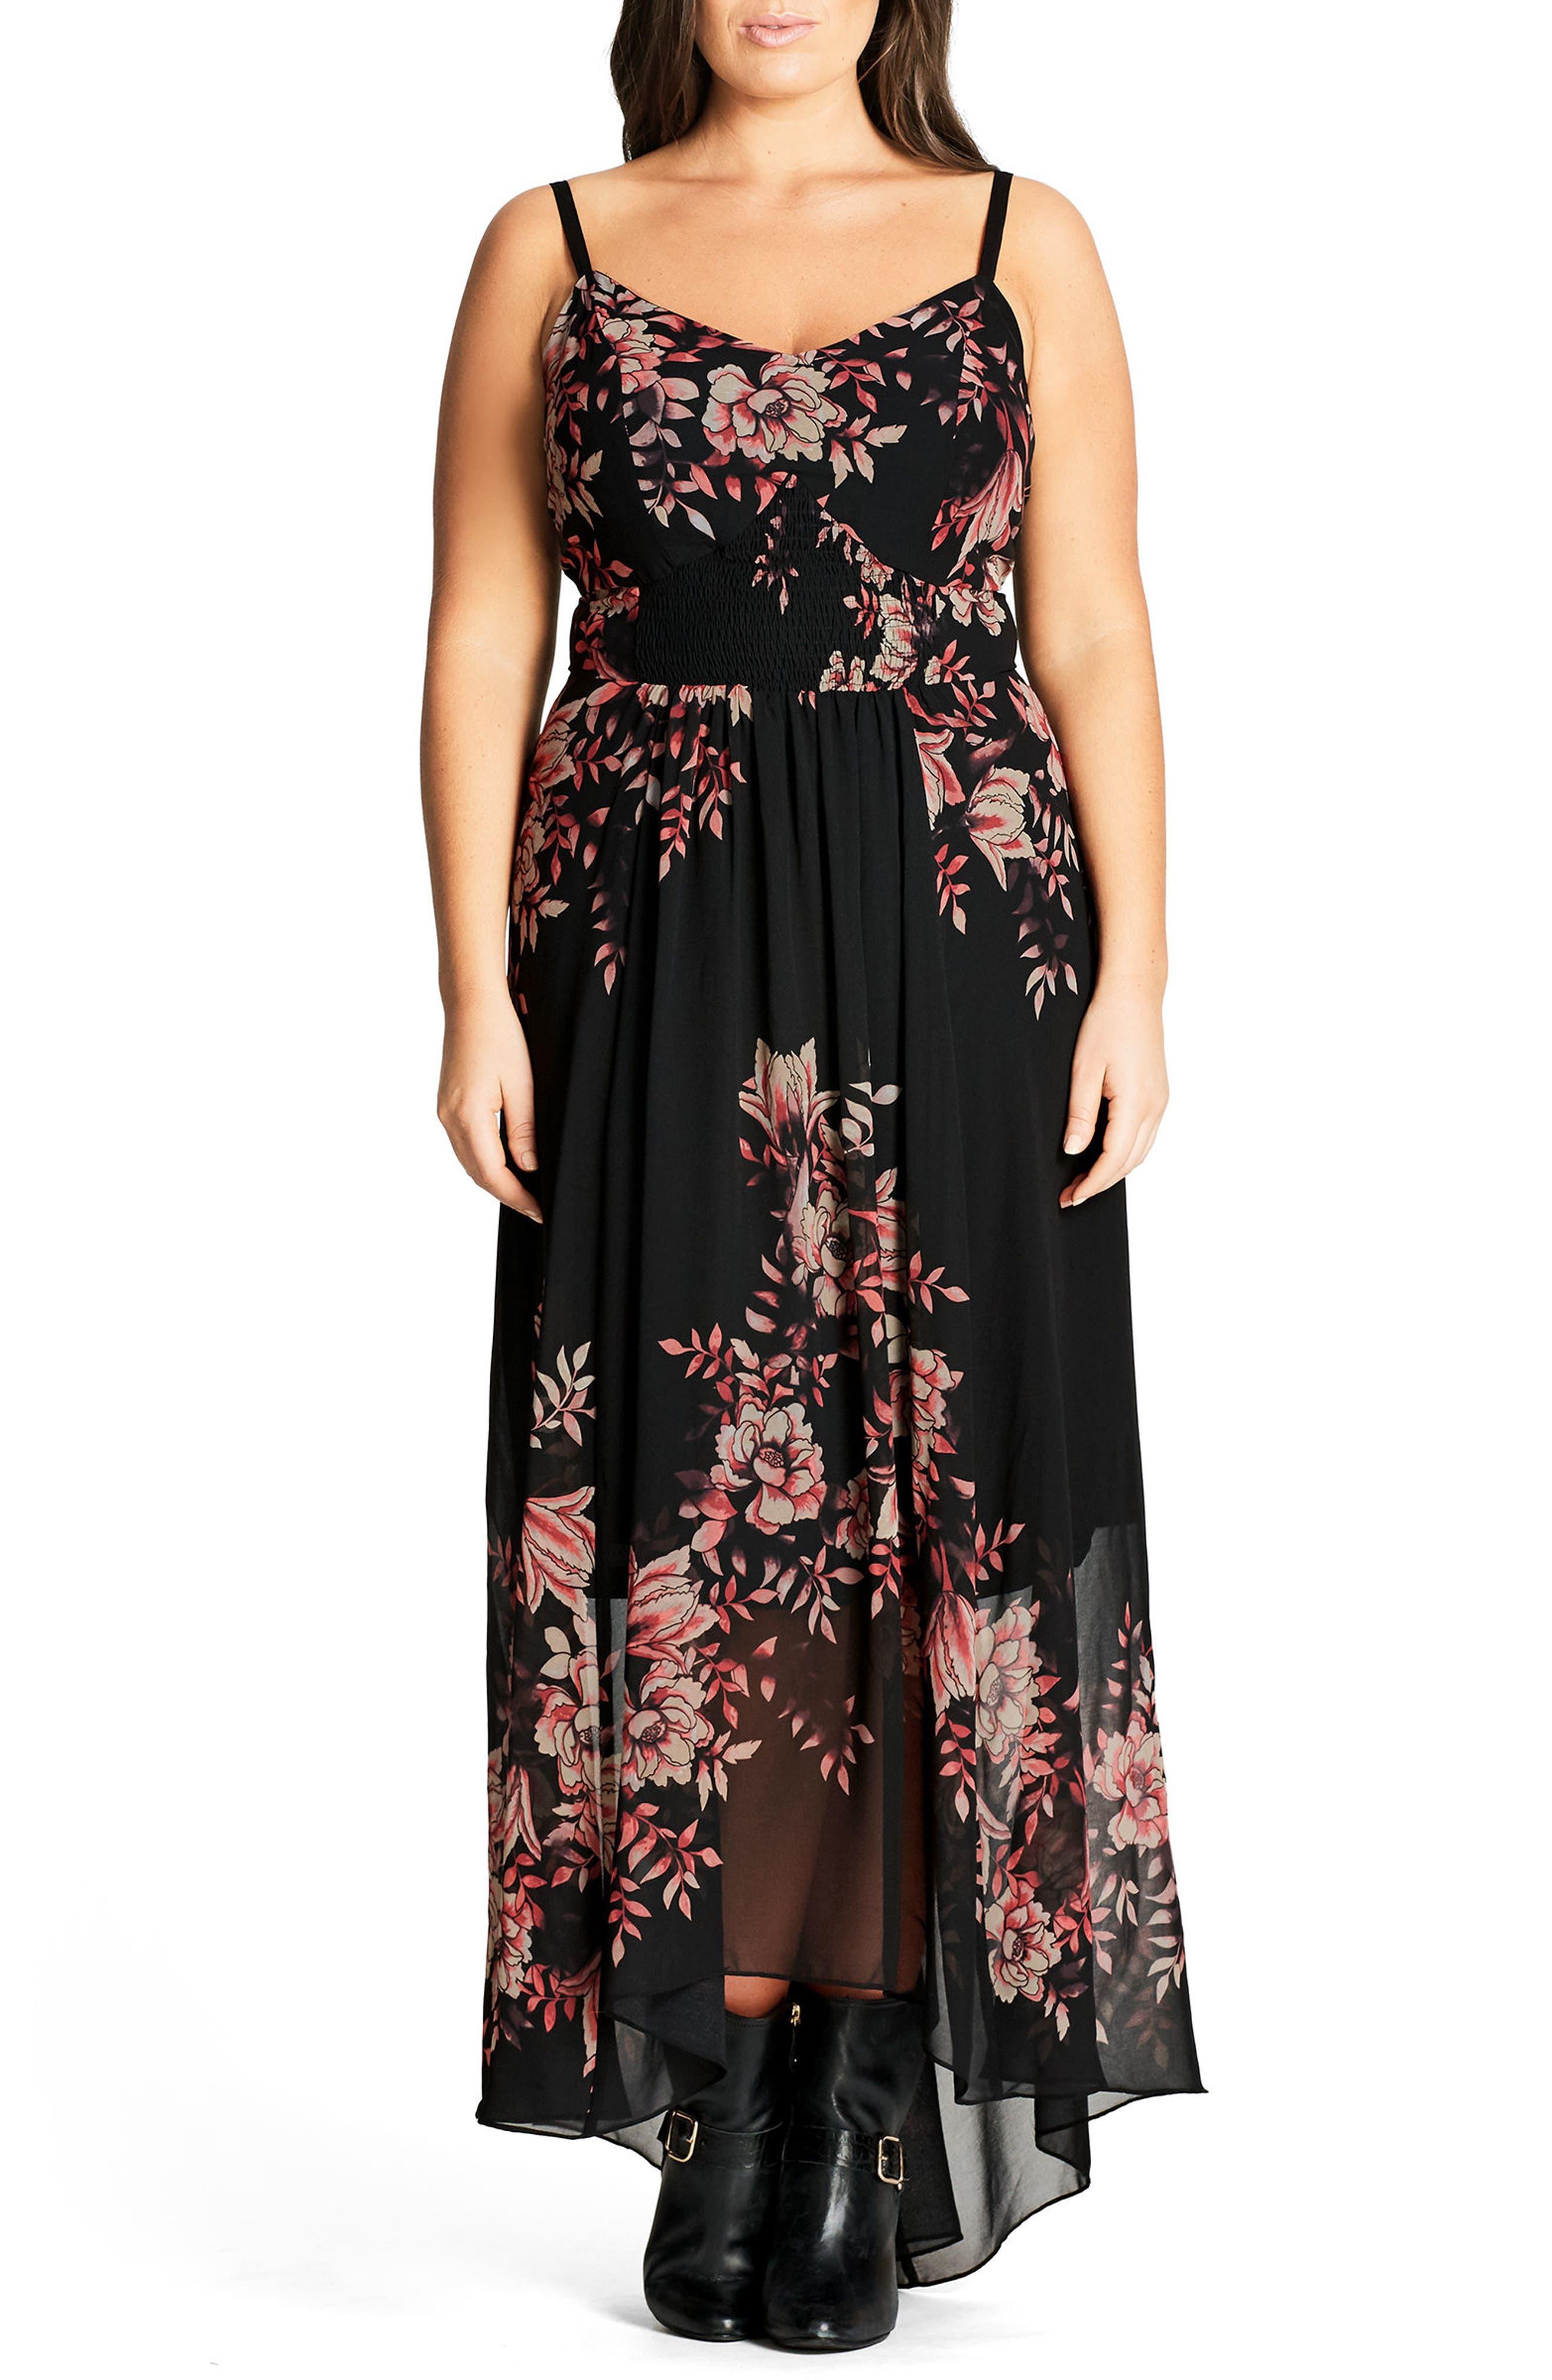 Main Image - City Chic Antique Floral Chiffon High/Low Maxi Dress (Plus Size)